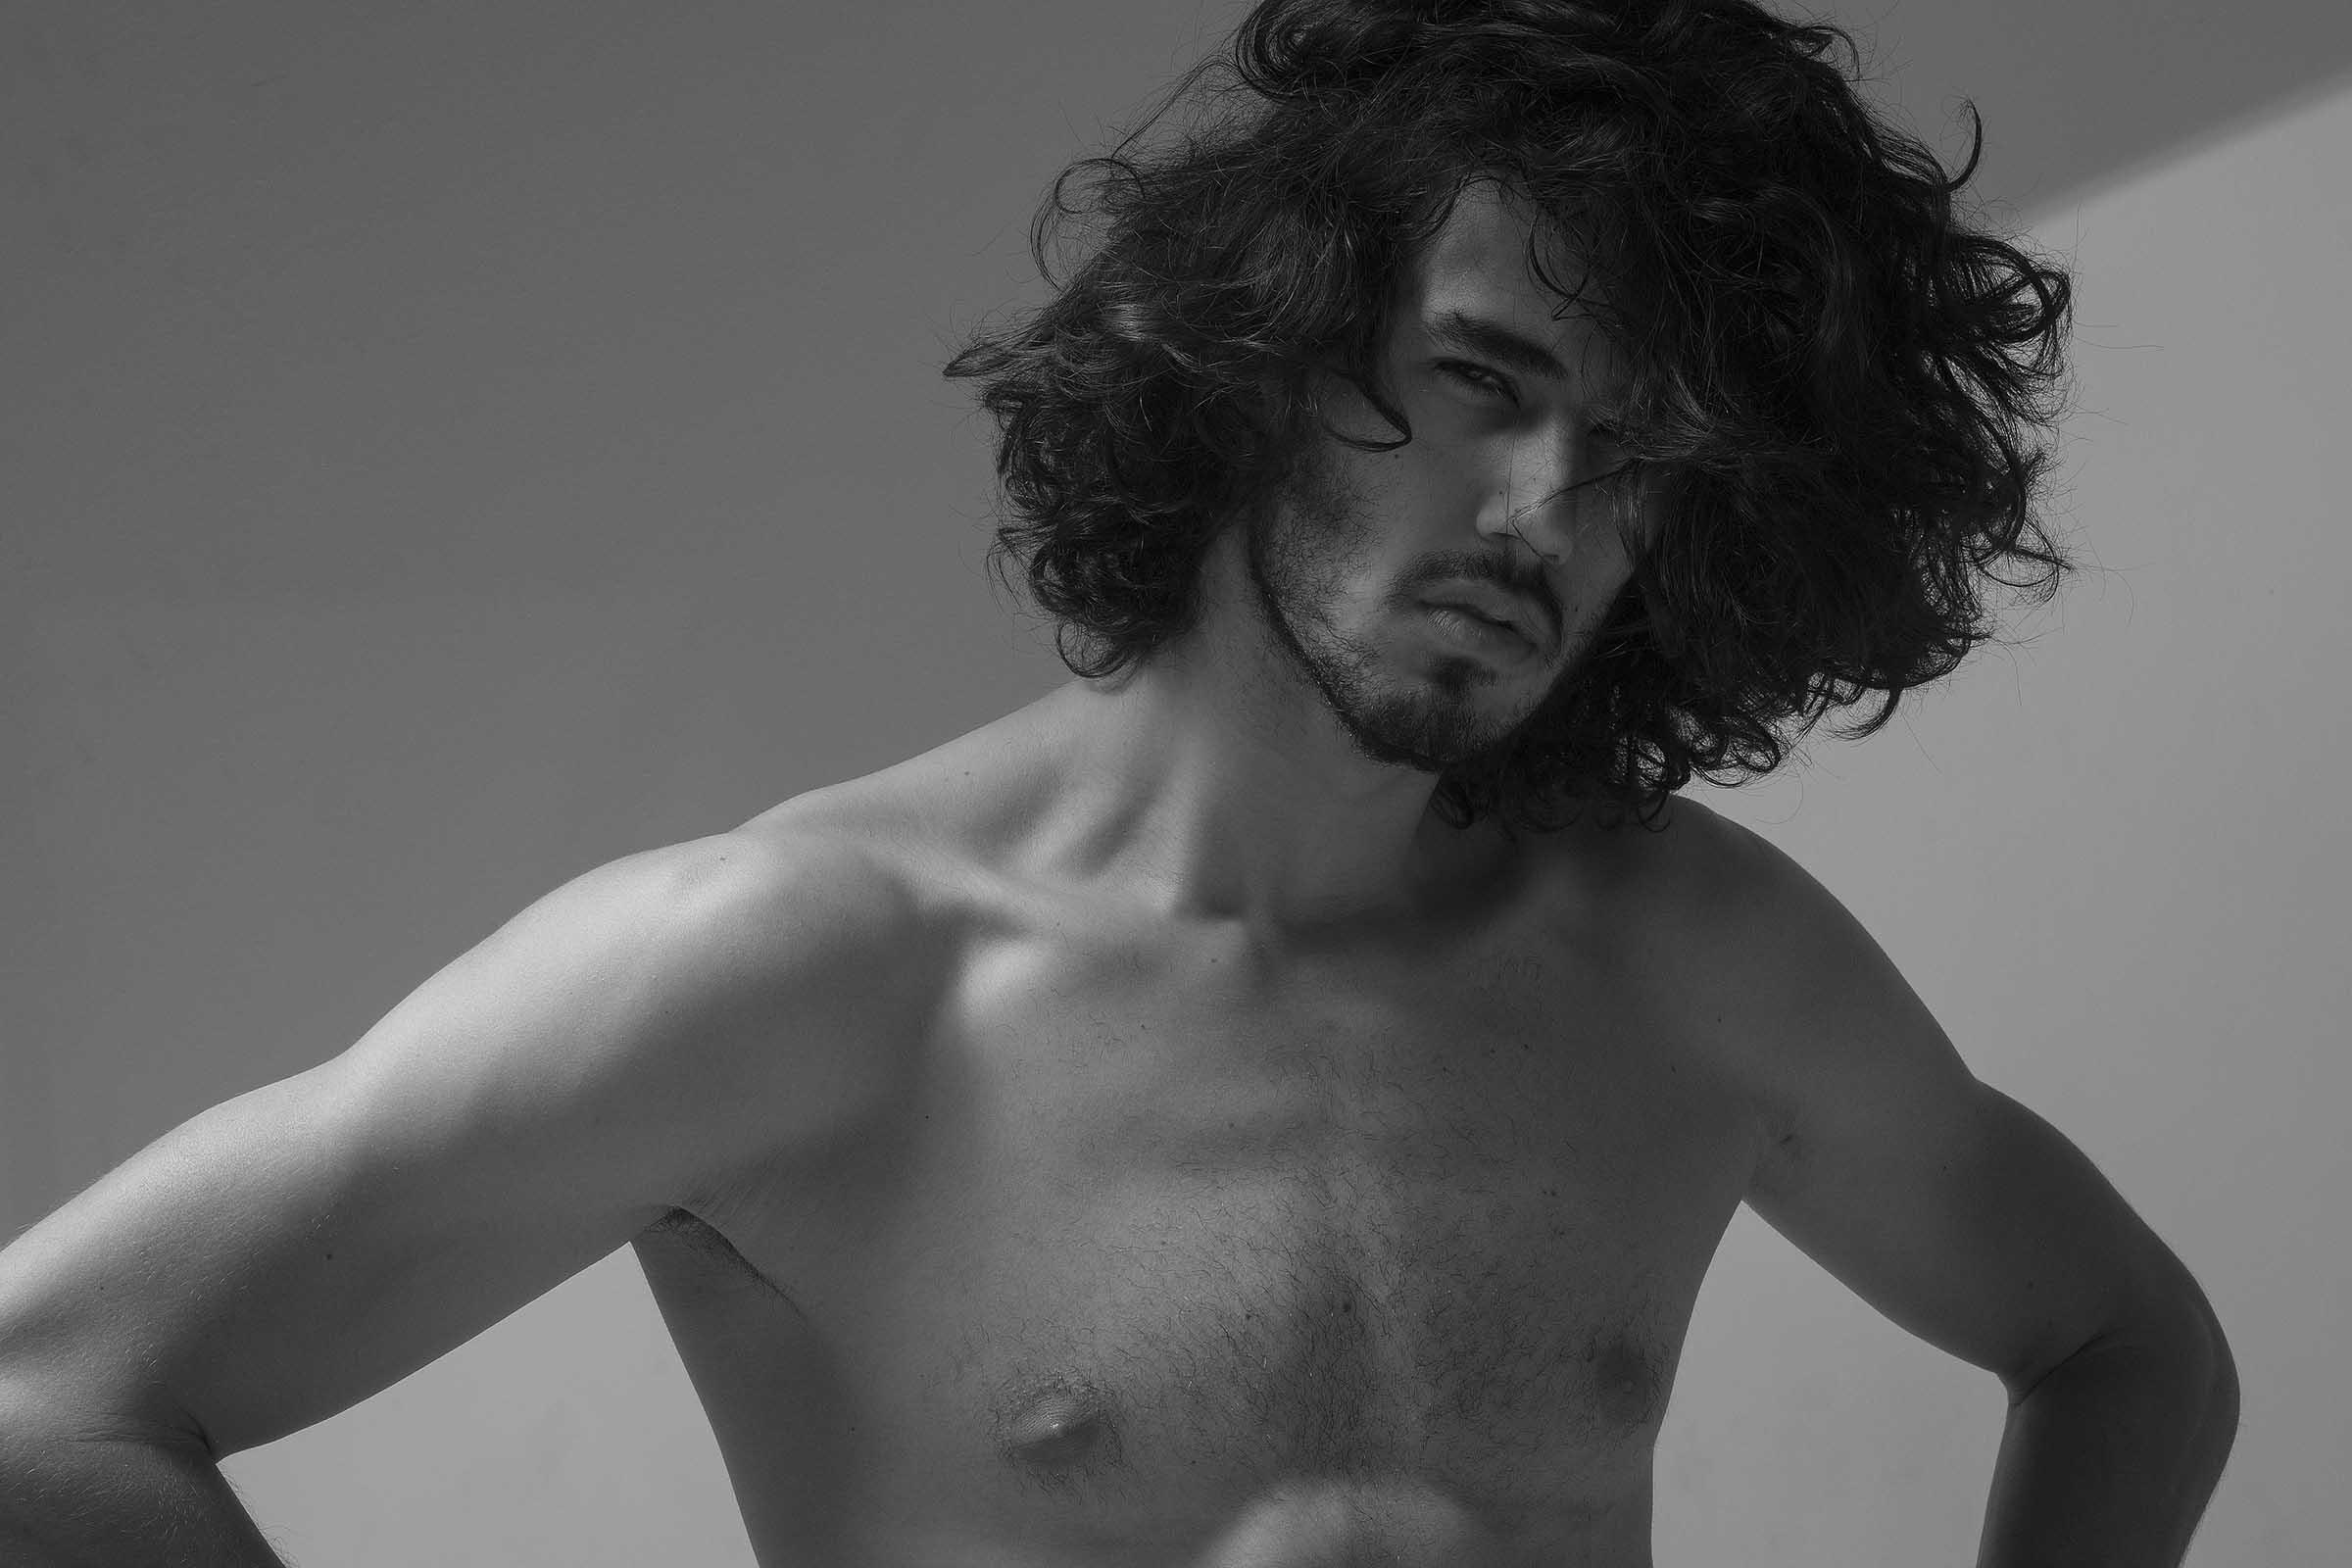 Gustavo Ferraz by Vinícius Moreira for Brazilian Male Model